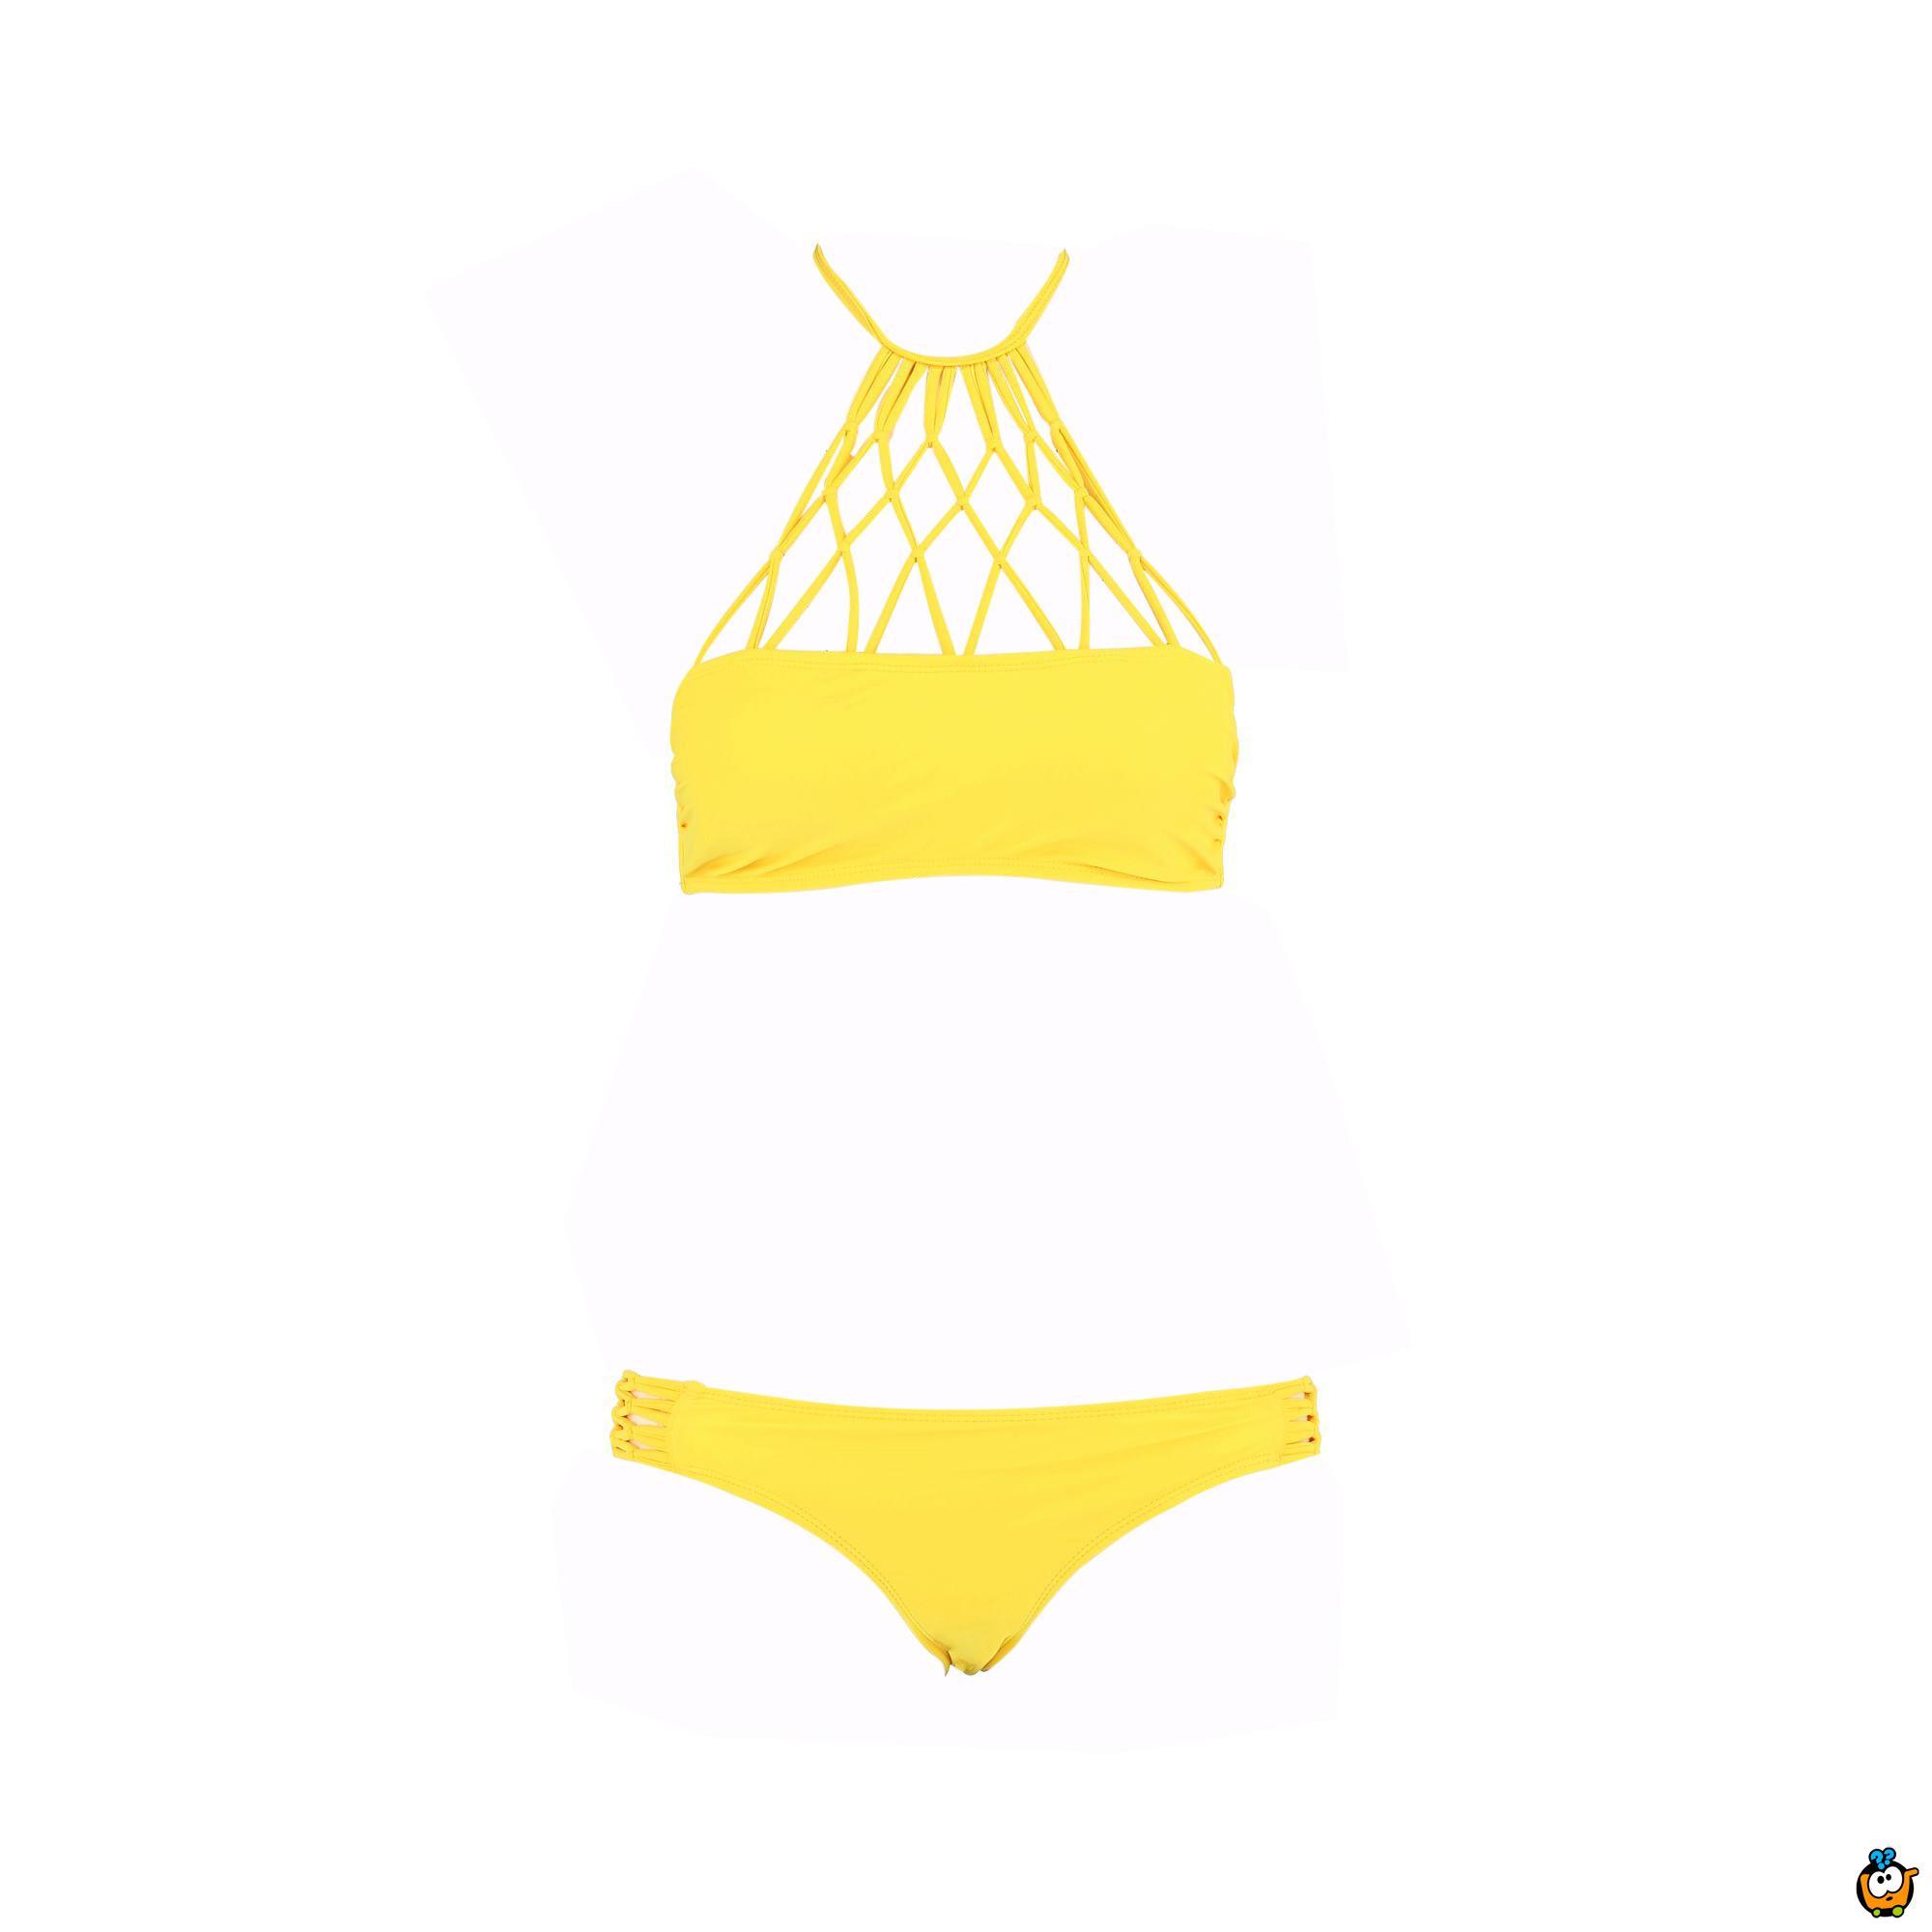 Dvodelni ženski kupaći kostim - SUPERMESH YELLOW